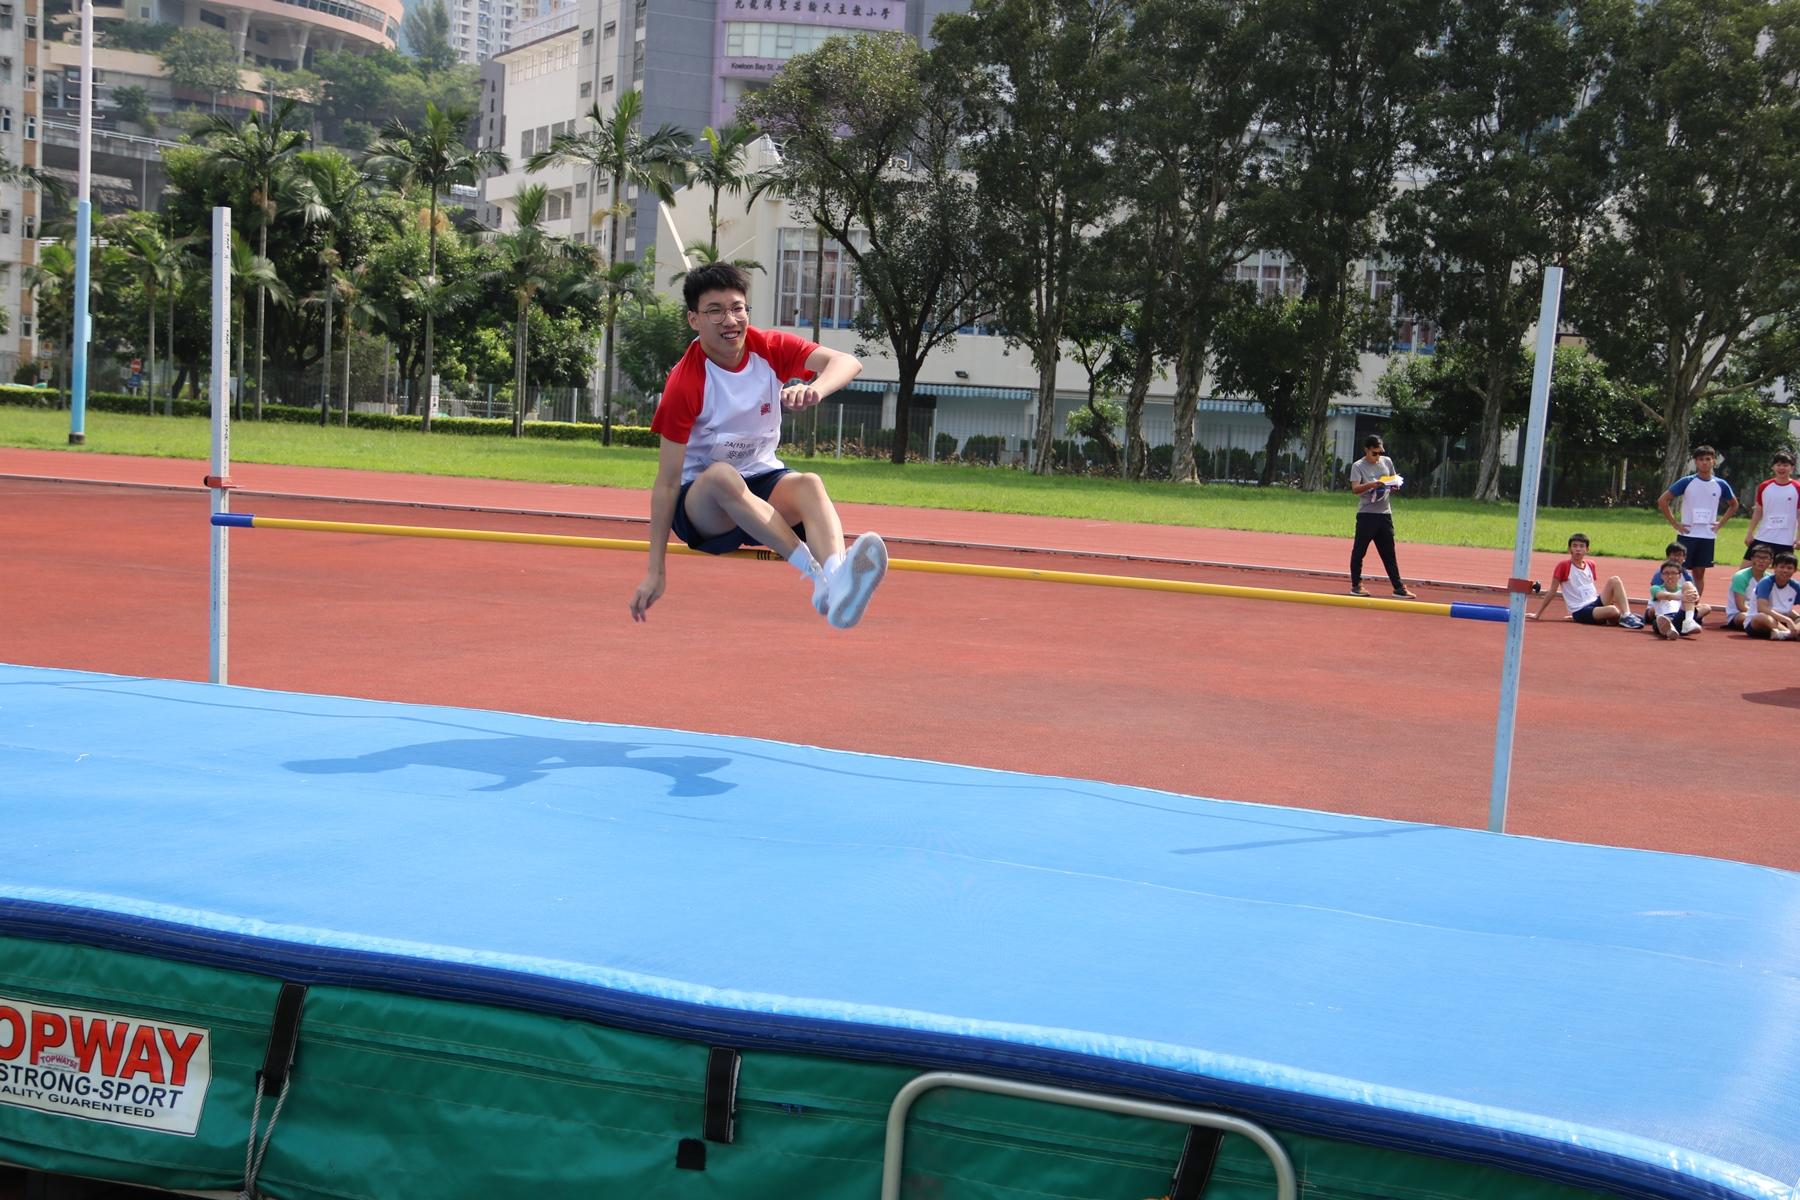 https://www.npc.edu.hk/sites/default/files/img_4656_1.jpg